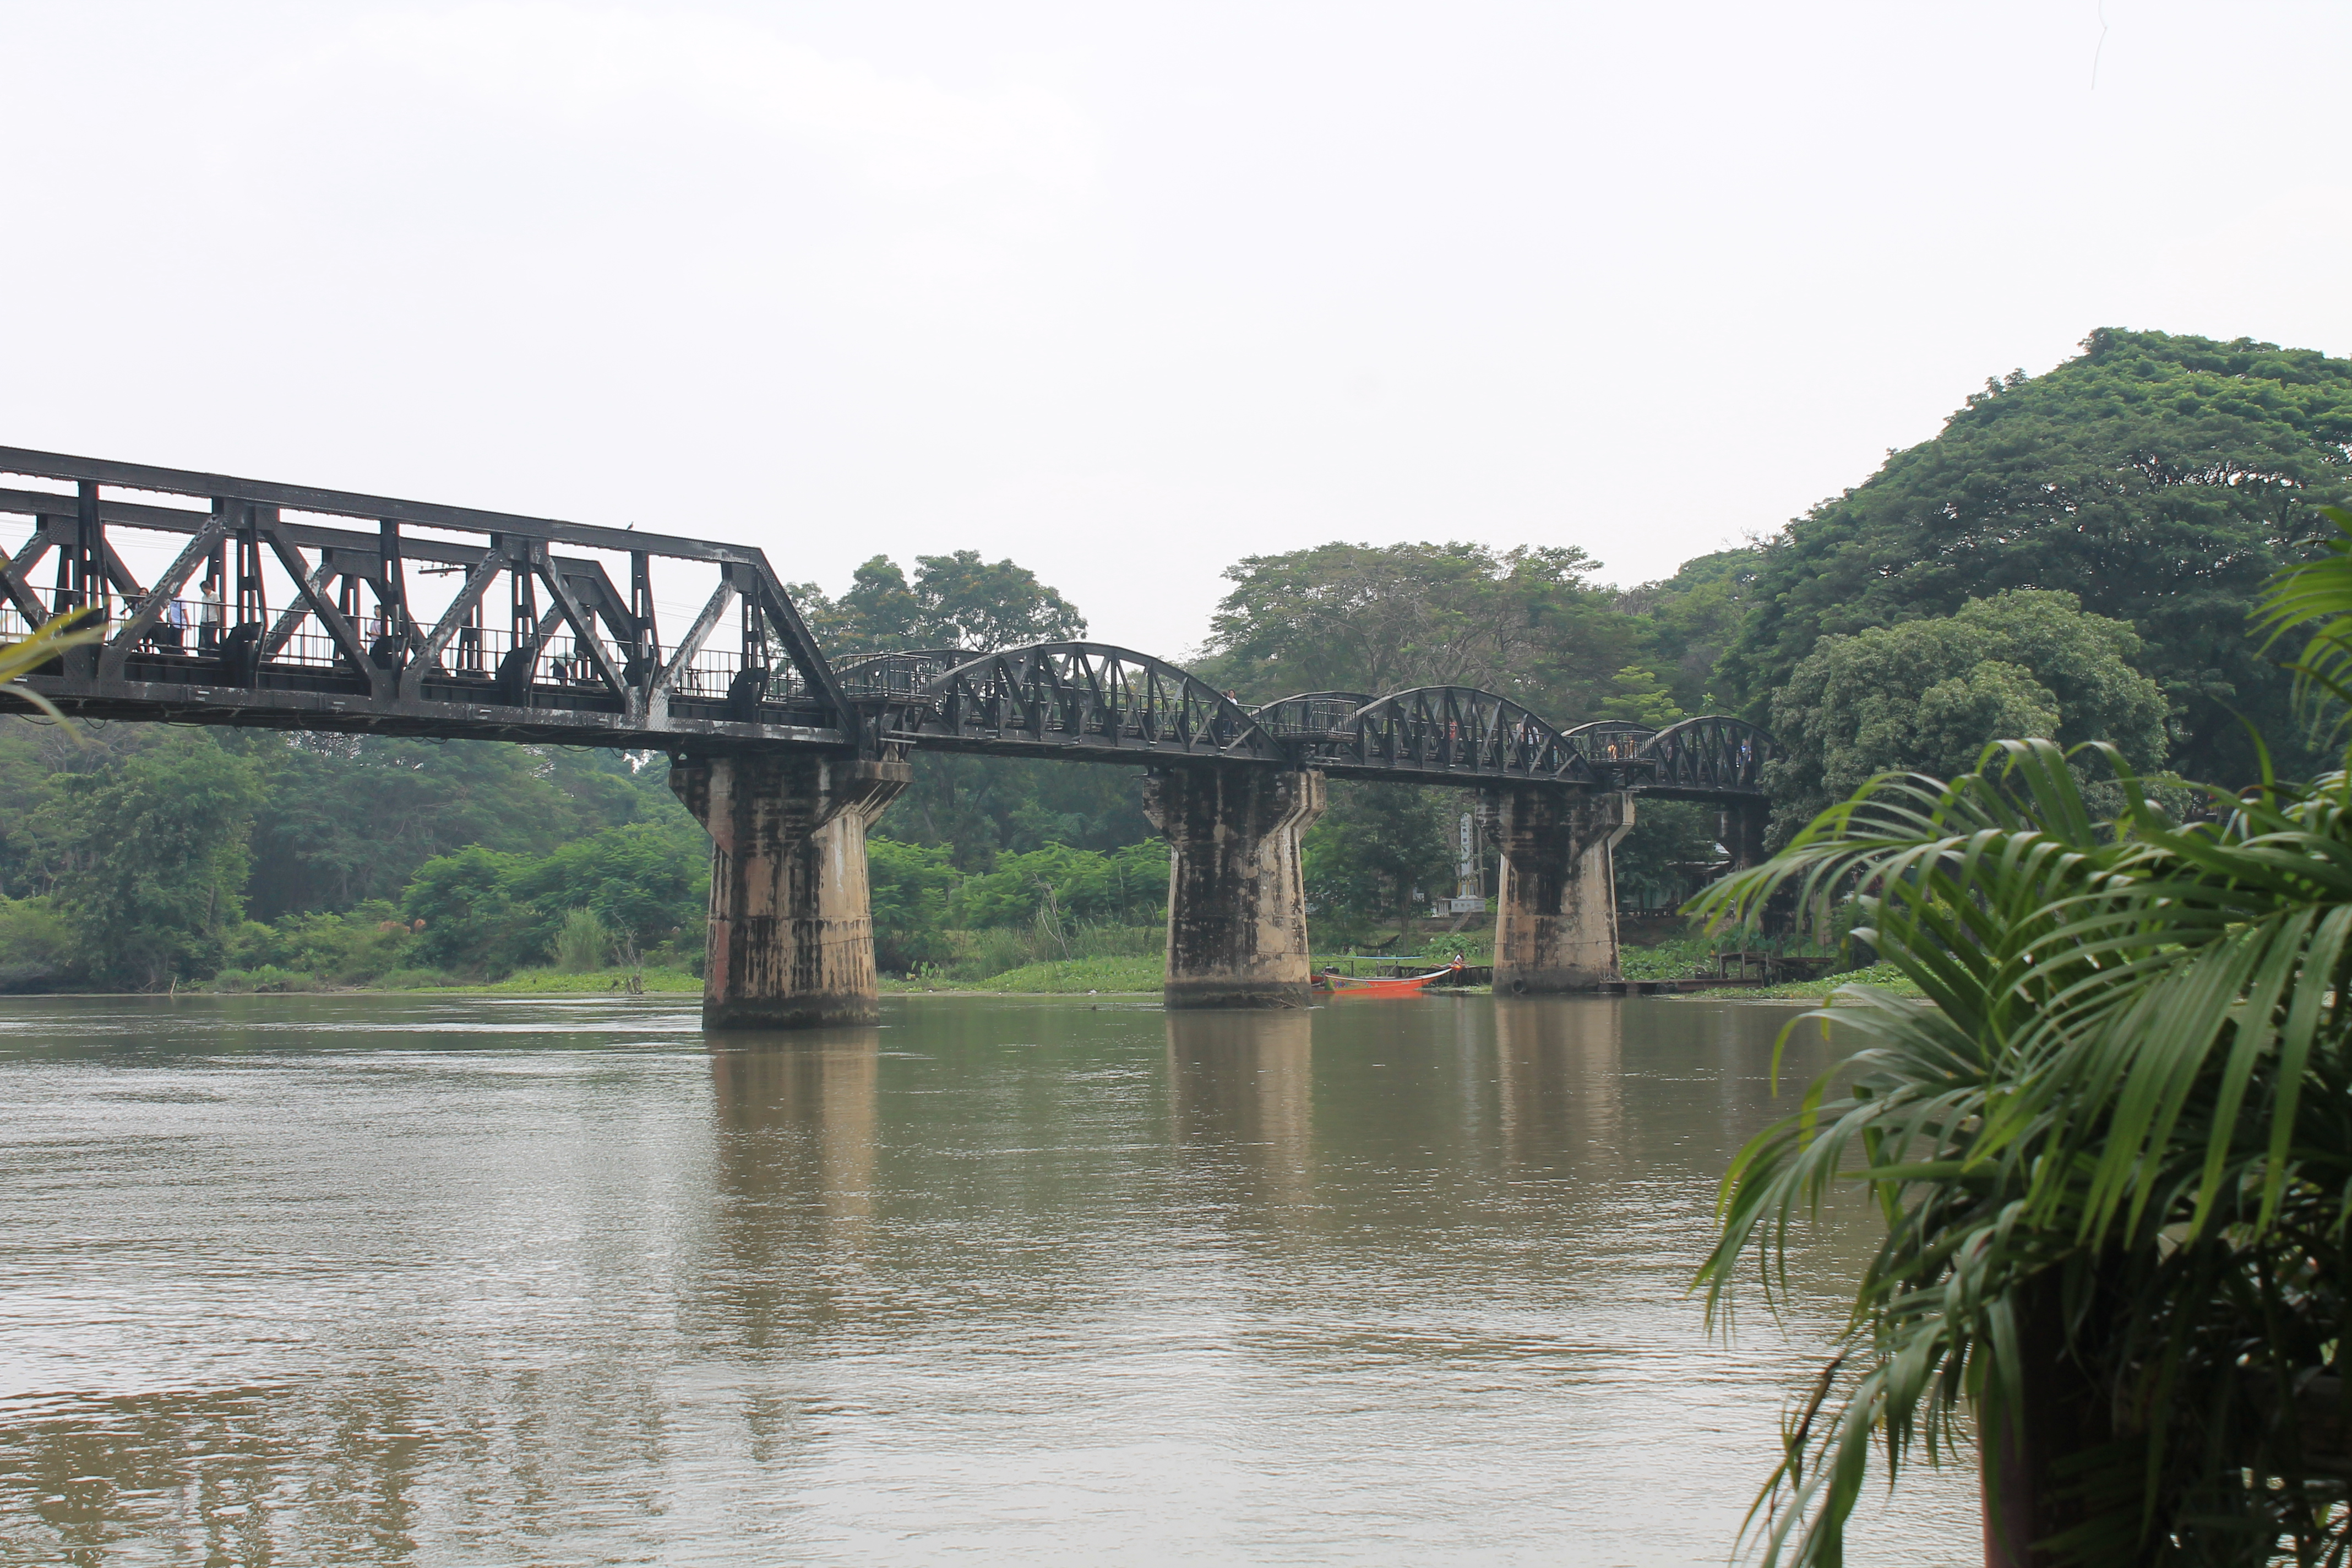 Bridge over the River Kwai, Kanchanaburi, Thailand, Landolia, a World of Photos